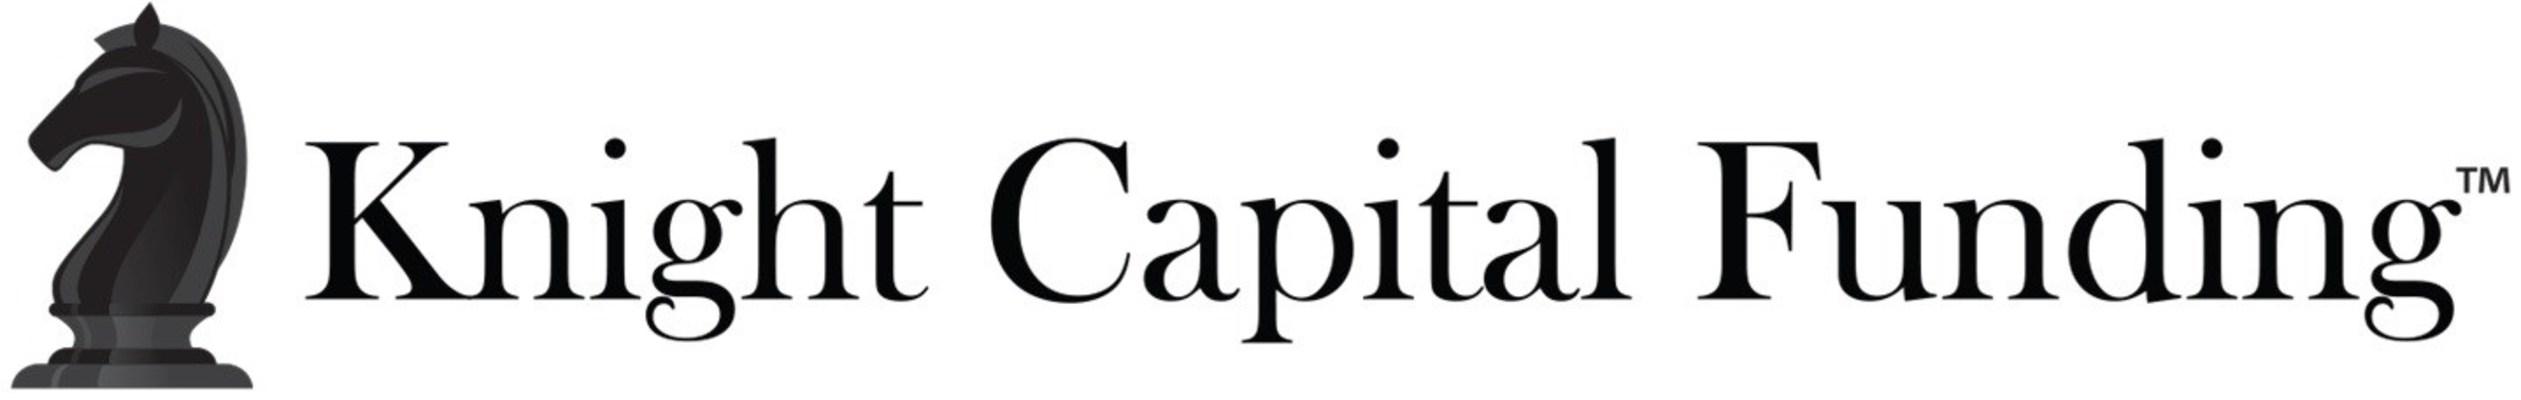 Knight Capital Funding